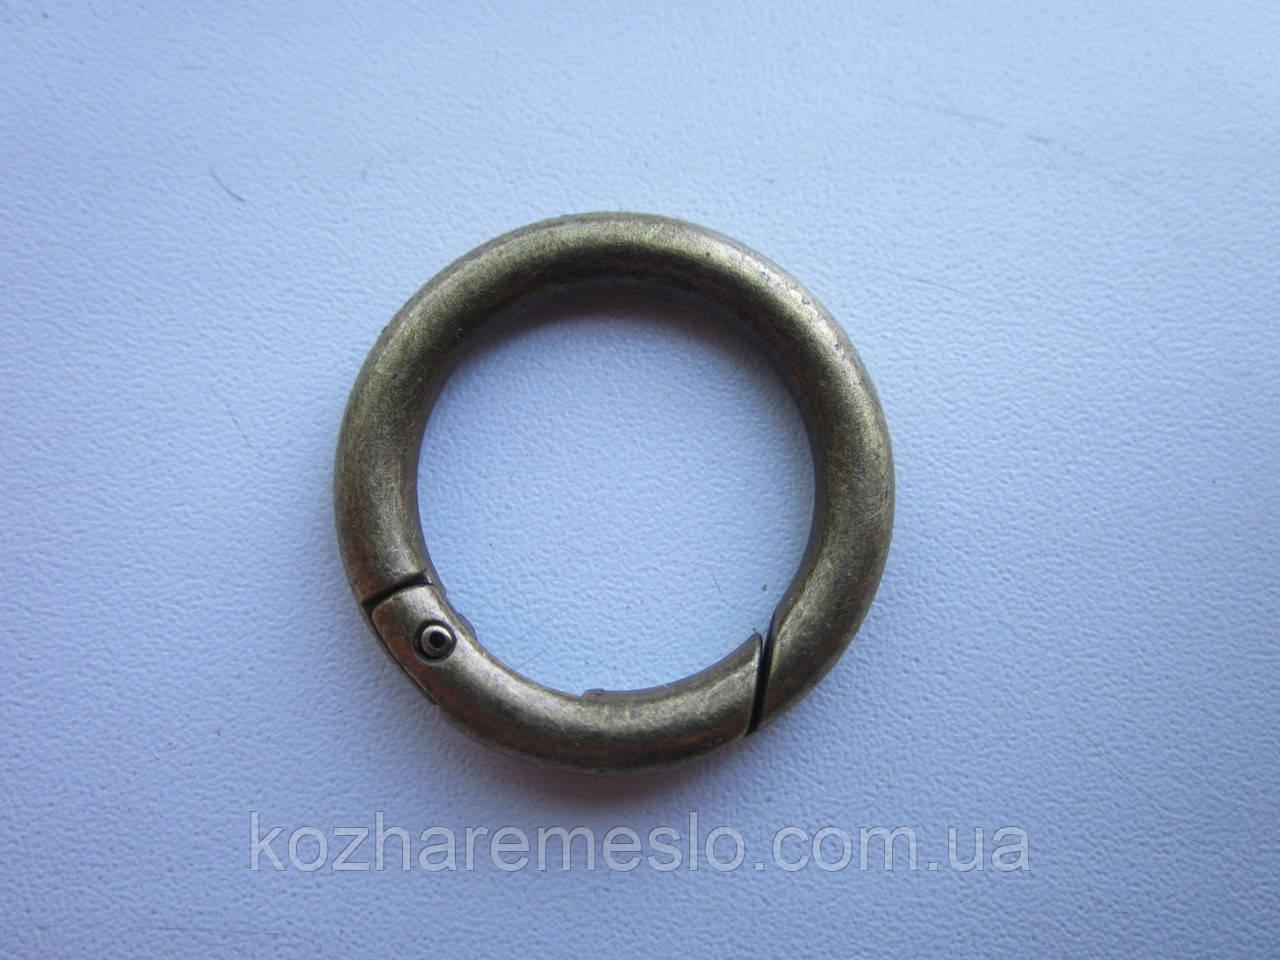 Кольцо - карабин 20 х 4 мм антик